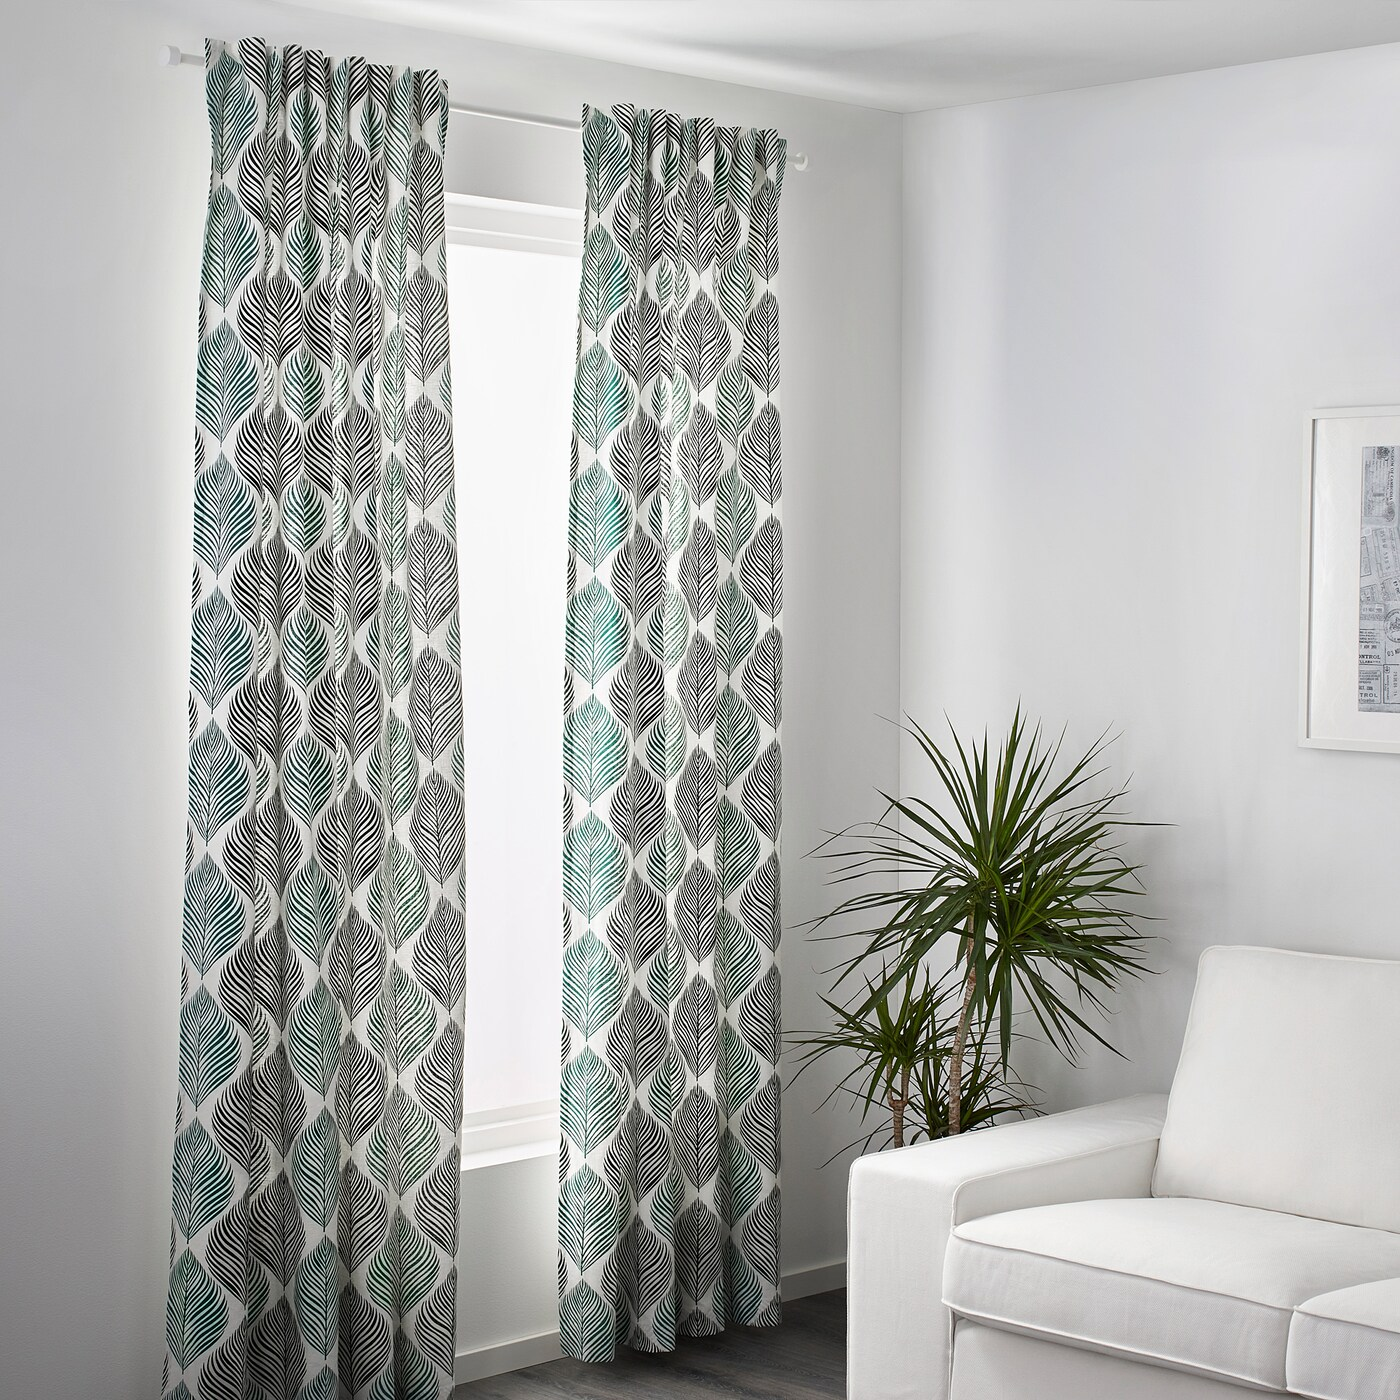 fjaderklint rideaux 2 pieces blanc vert 145x300 cm